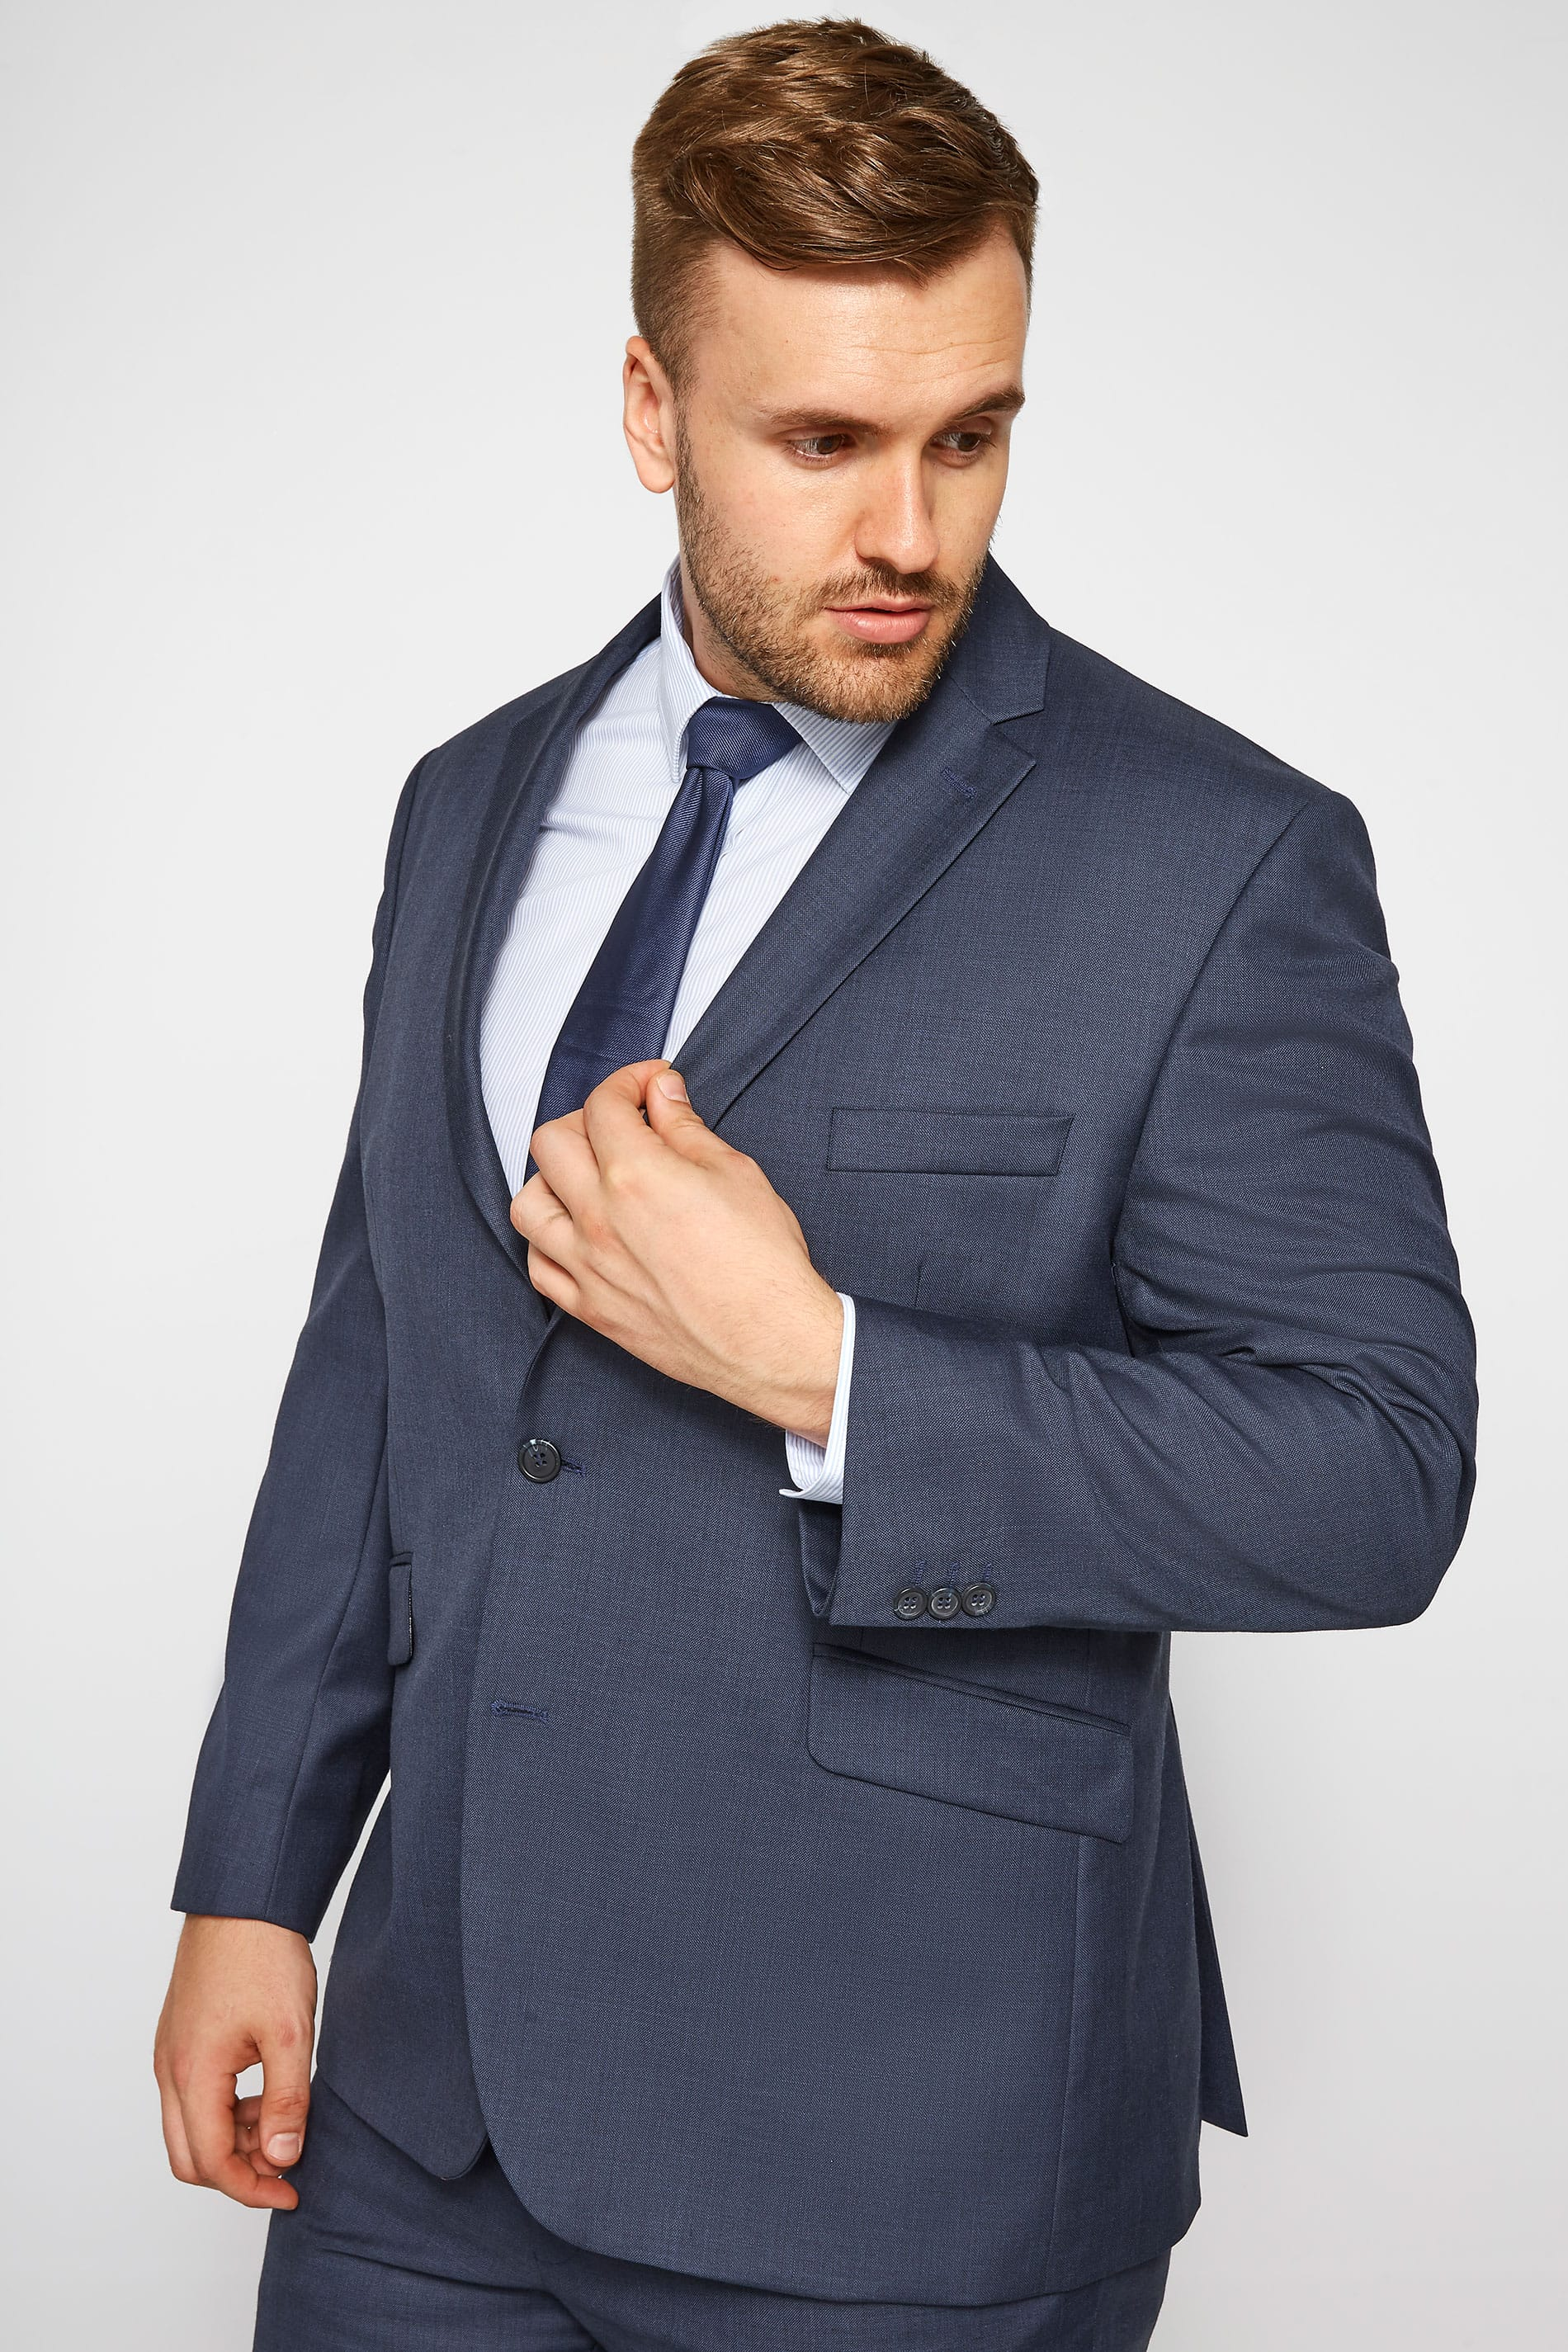 BadRhino Navy Sharkskin Suit Jacket